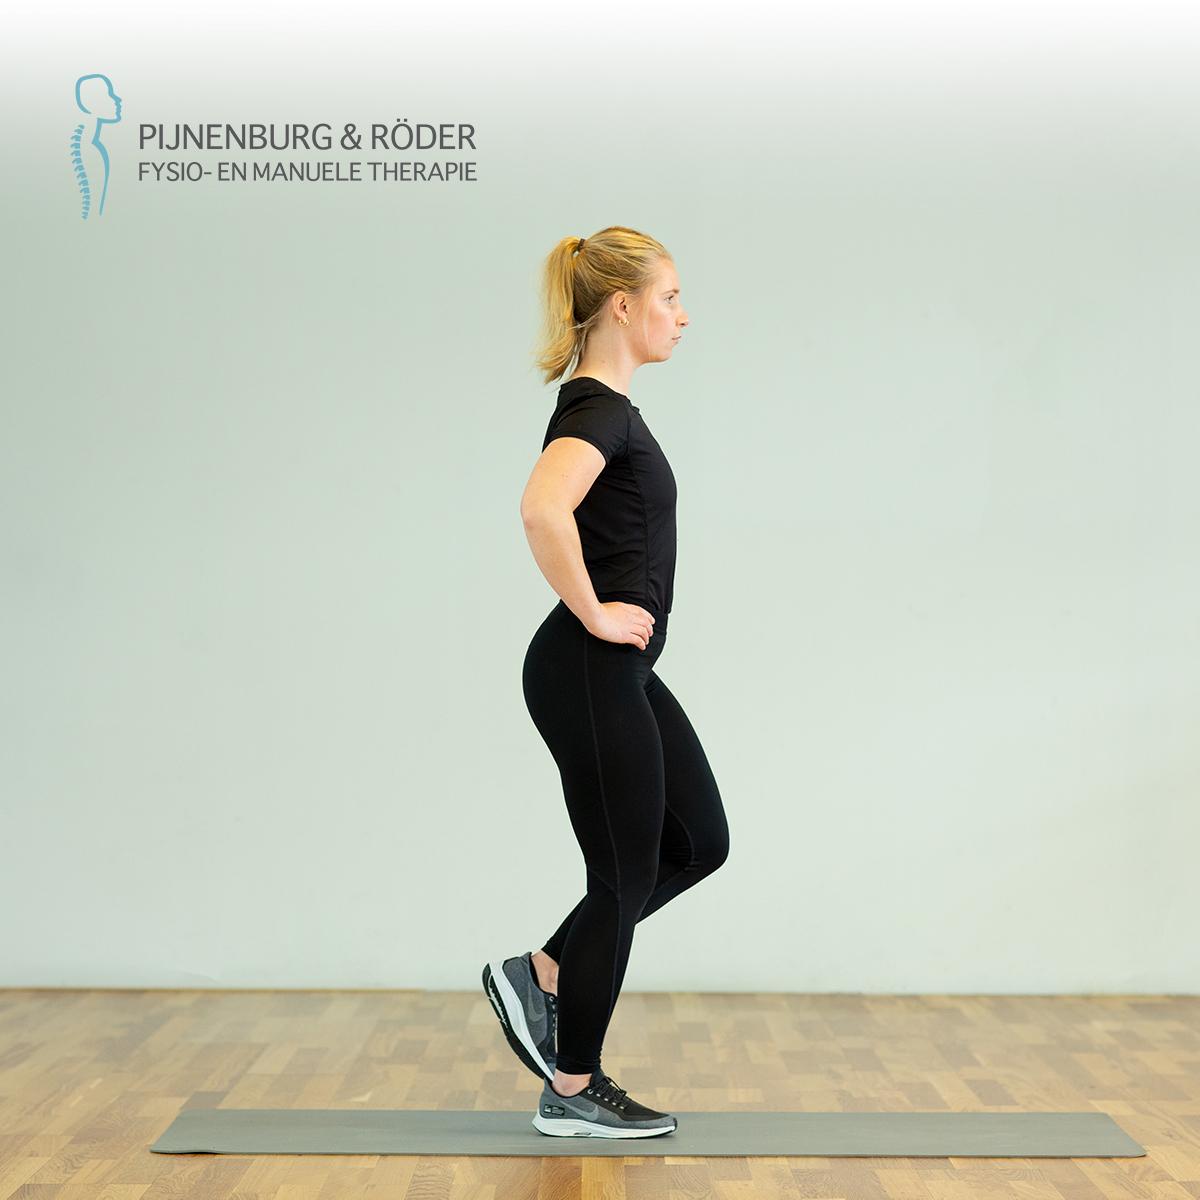 stabiliteit oefening knie single leg squat